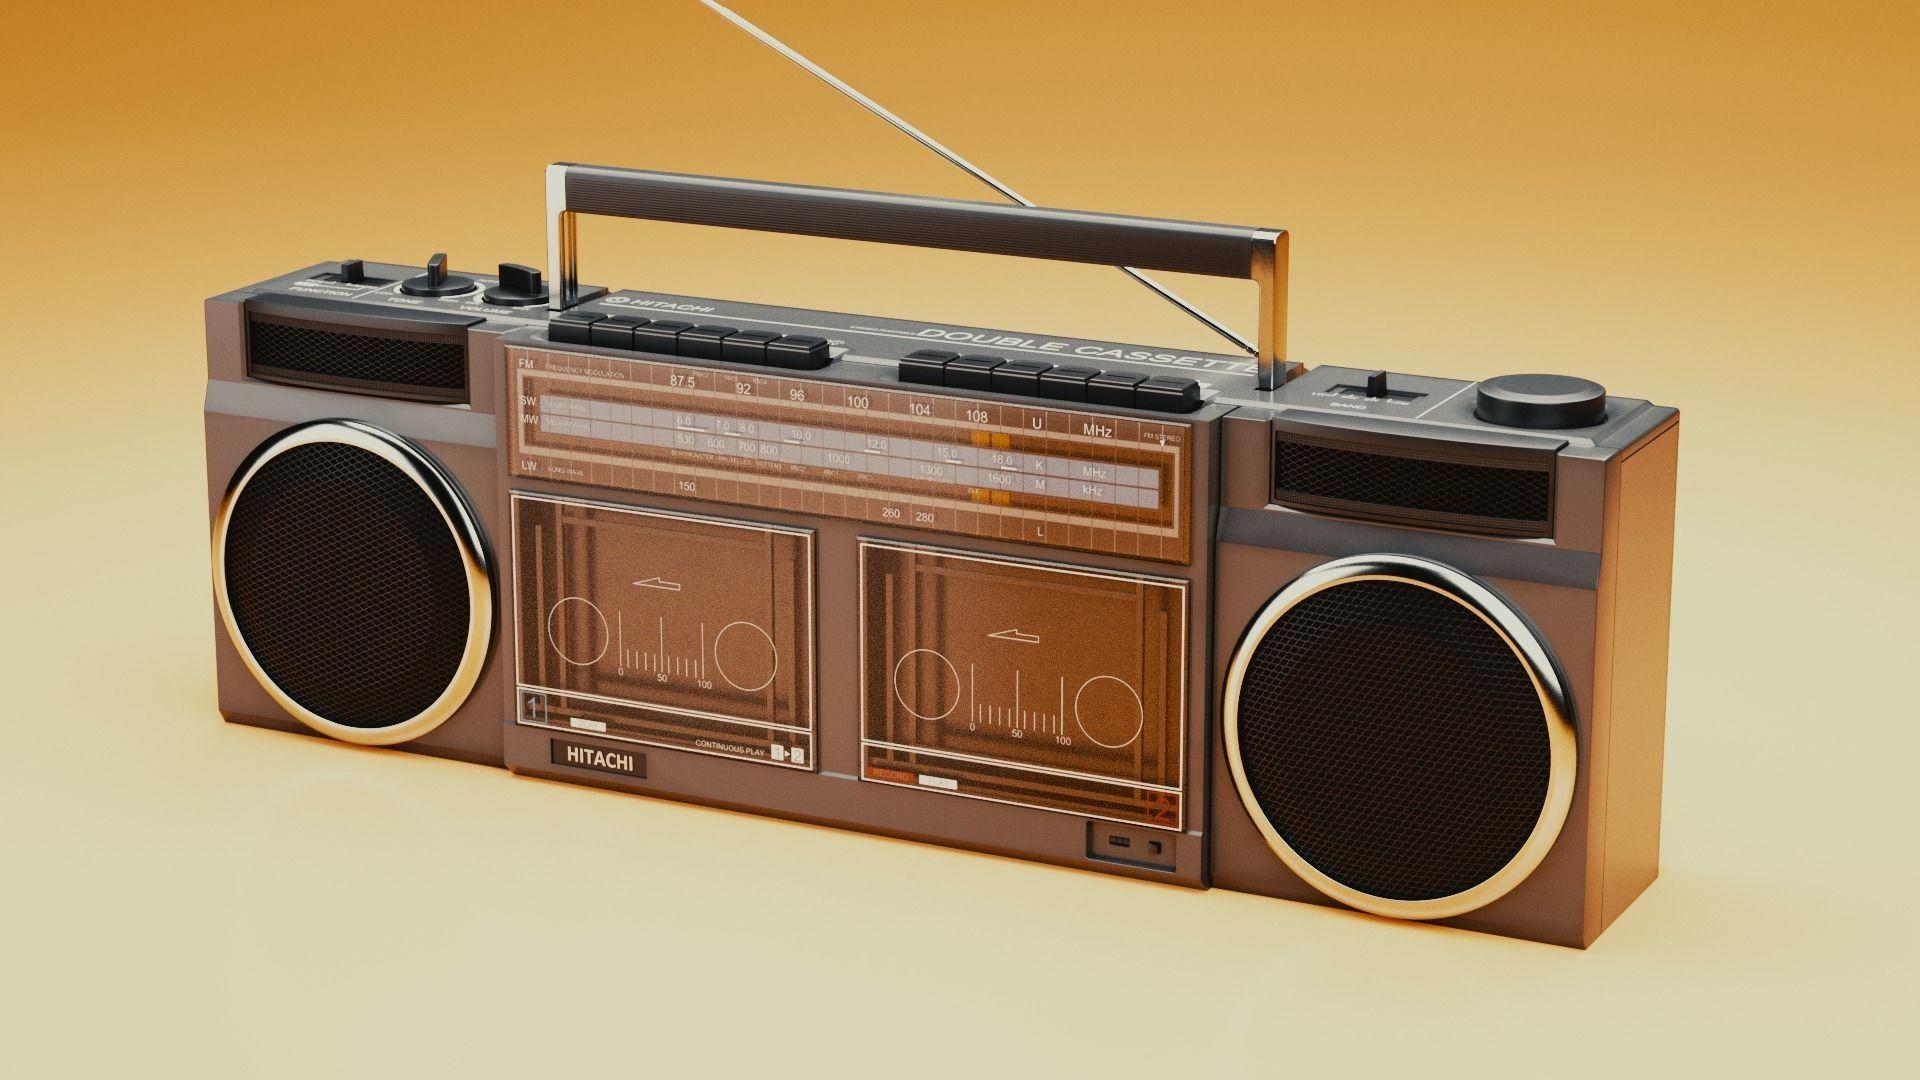 radio-3d-model-obj-mtl-fbx-stl-blend (4).jpg